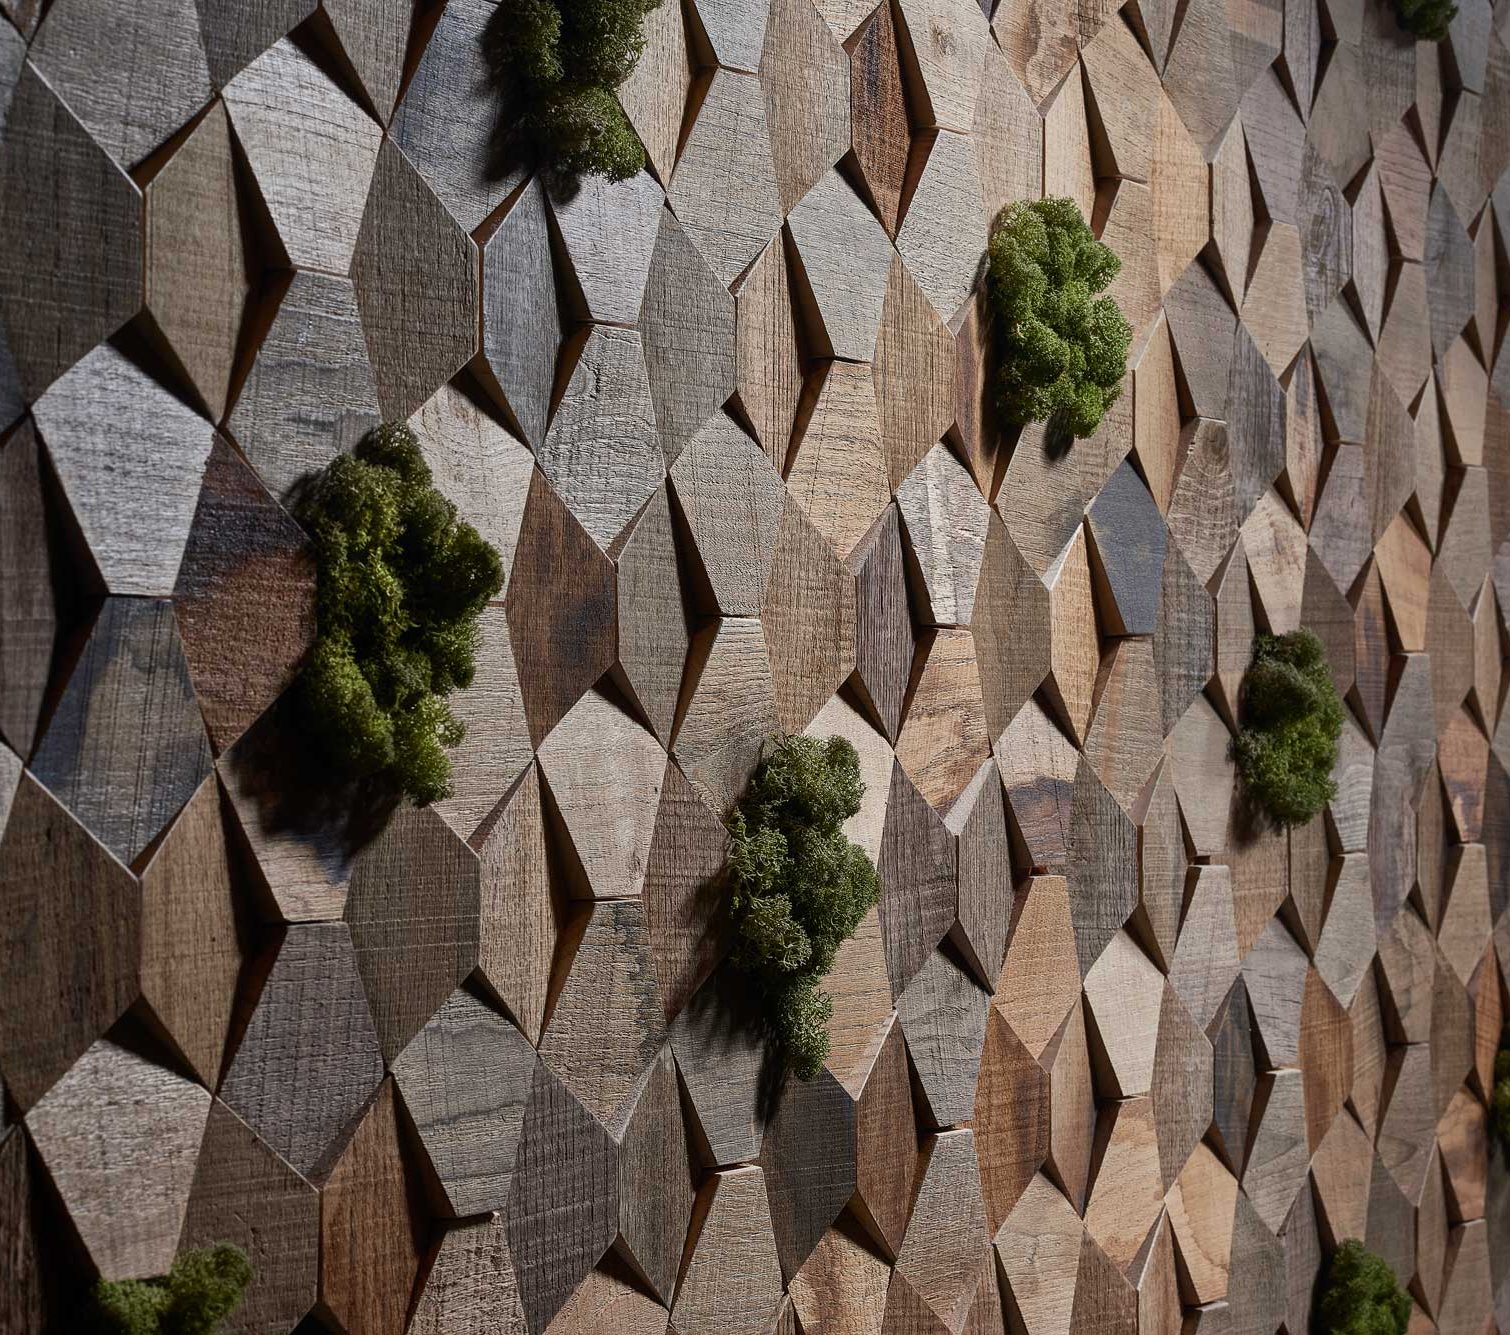 wandgeastaltung-wandpaneele-aus-recyceltem-kastanienholz-3